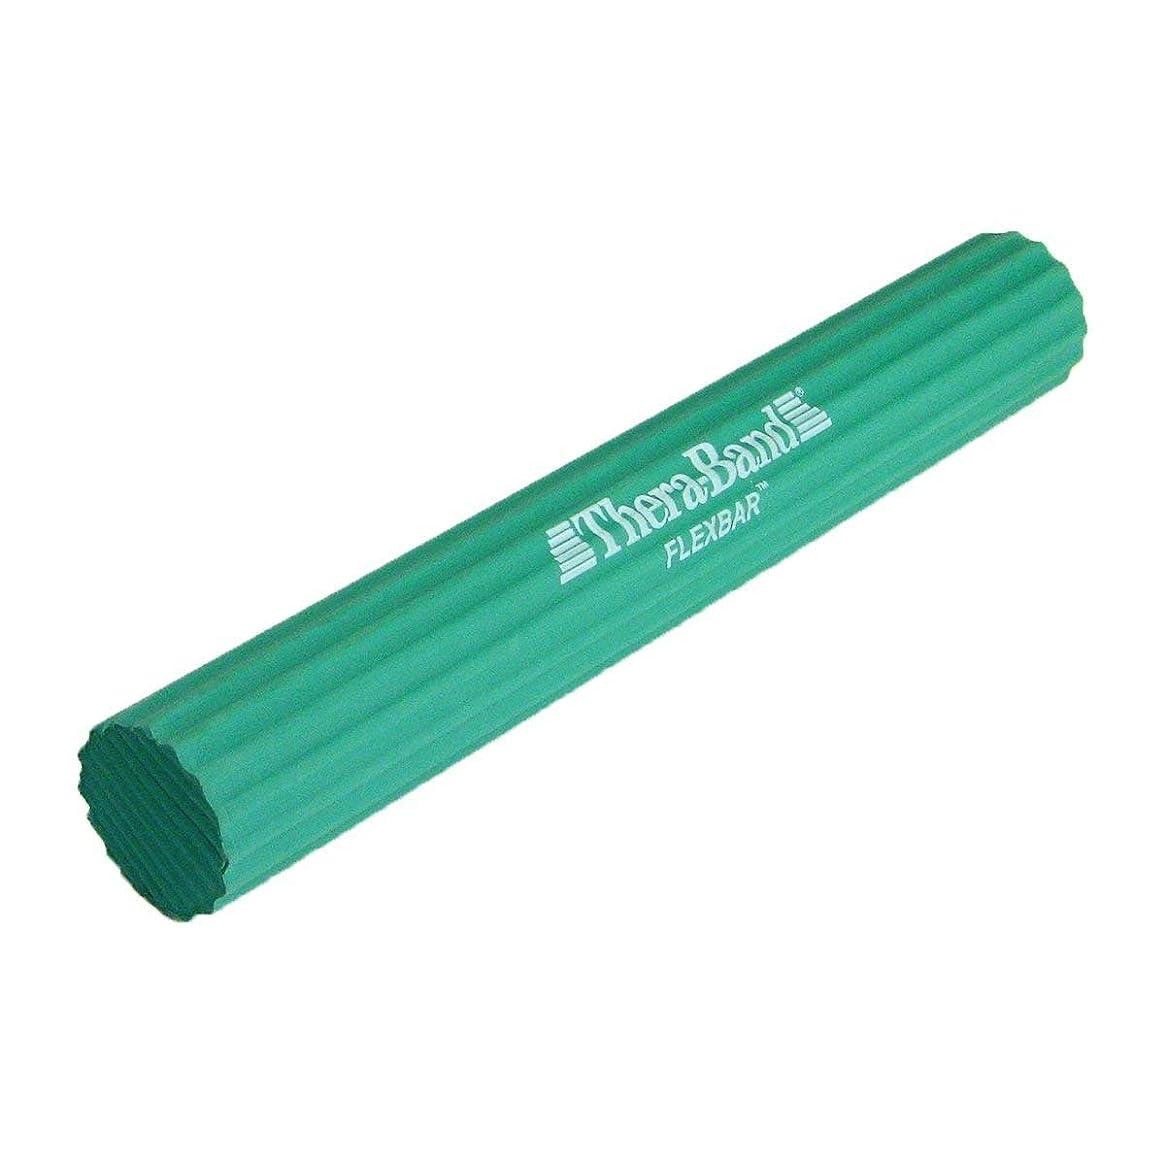 TheraBand FlexBar, Tennis Elbow Therapy Bar, Relieve Tendonitis Pain & Improve Grip Strength, Resistance Bar for Golfers Elbow & Tendinitis, Yellow, Extra Light, Beginner - 26107